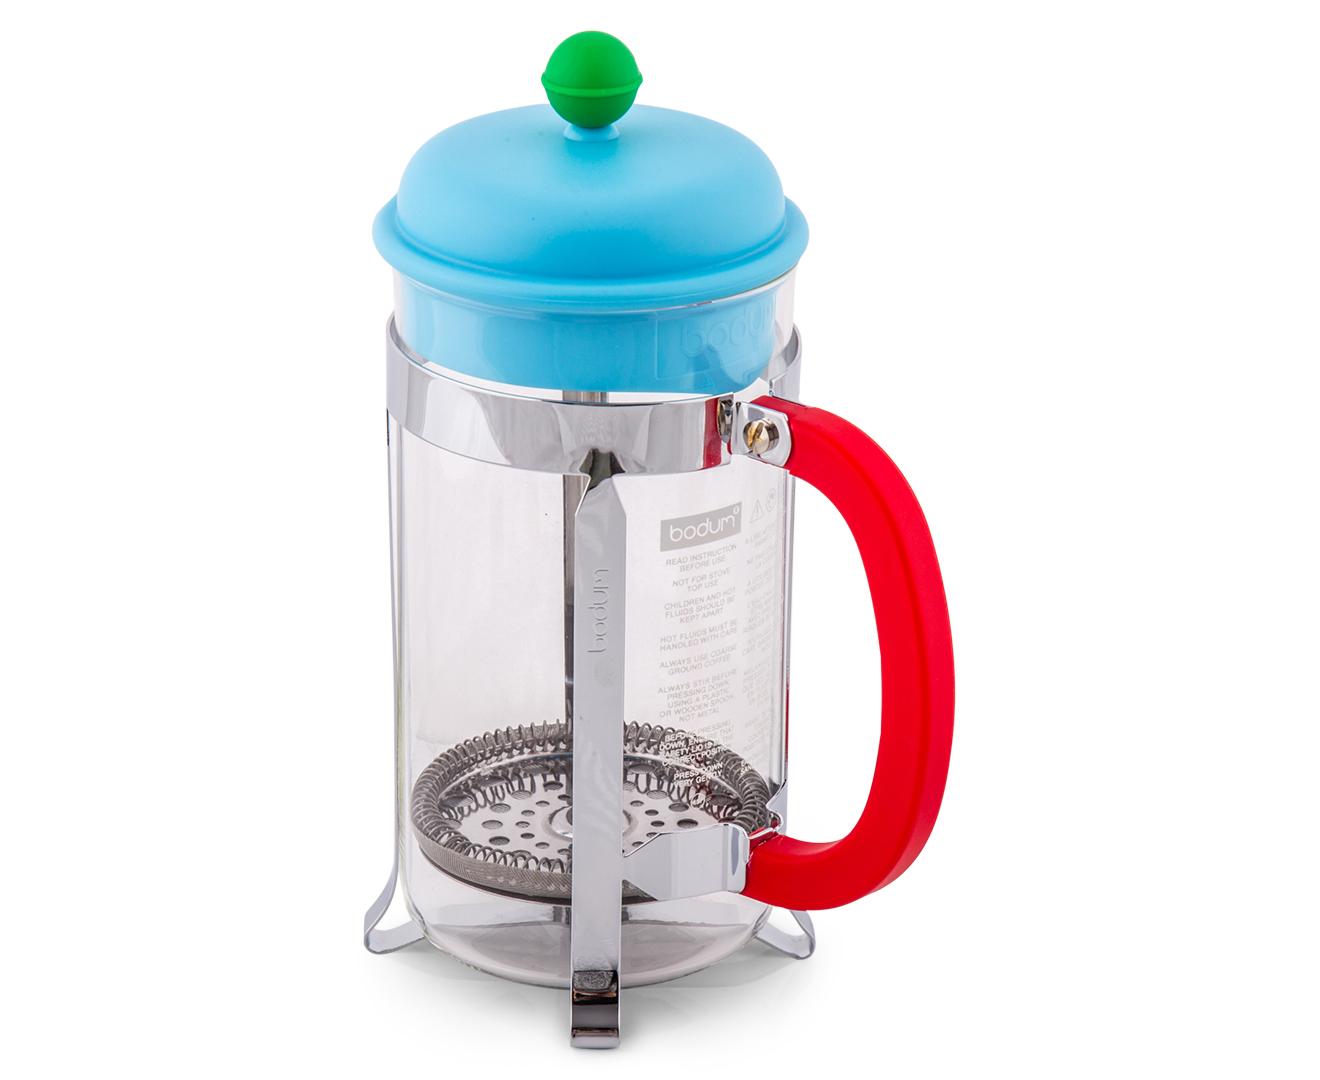 CatchOfTheDay.com.au BODUM 1L Coffee Maker - Green/Light Blue/Red